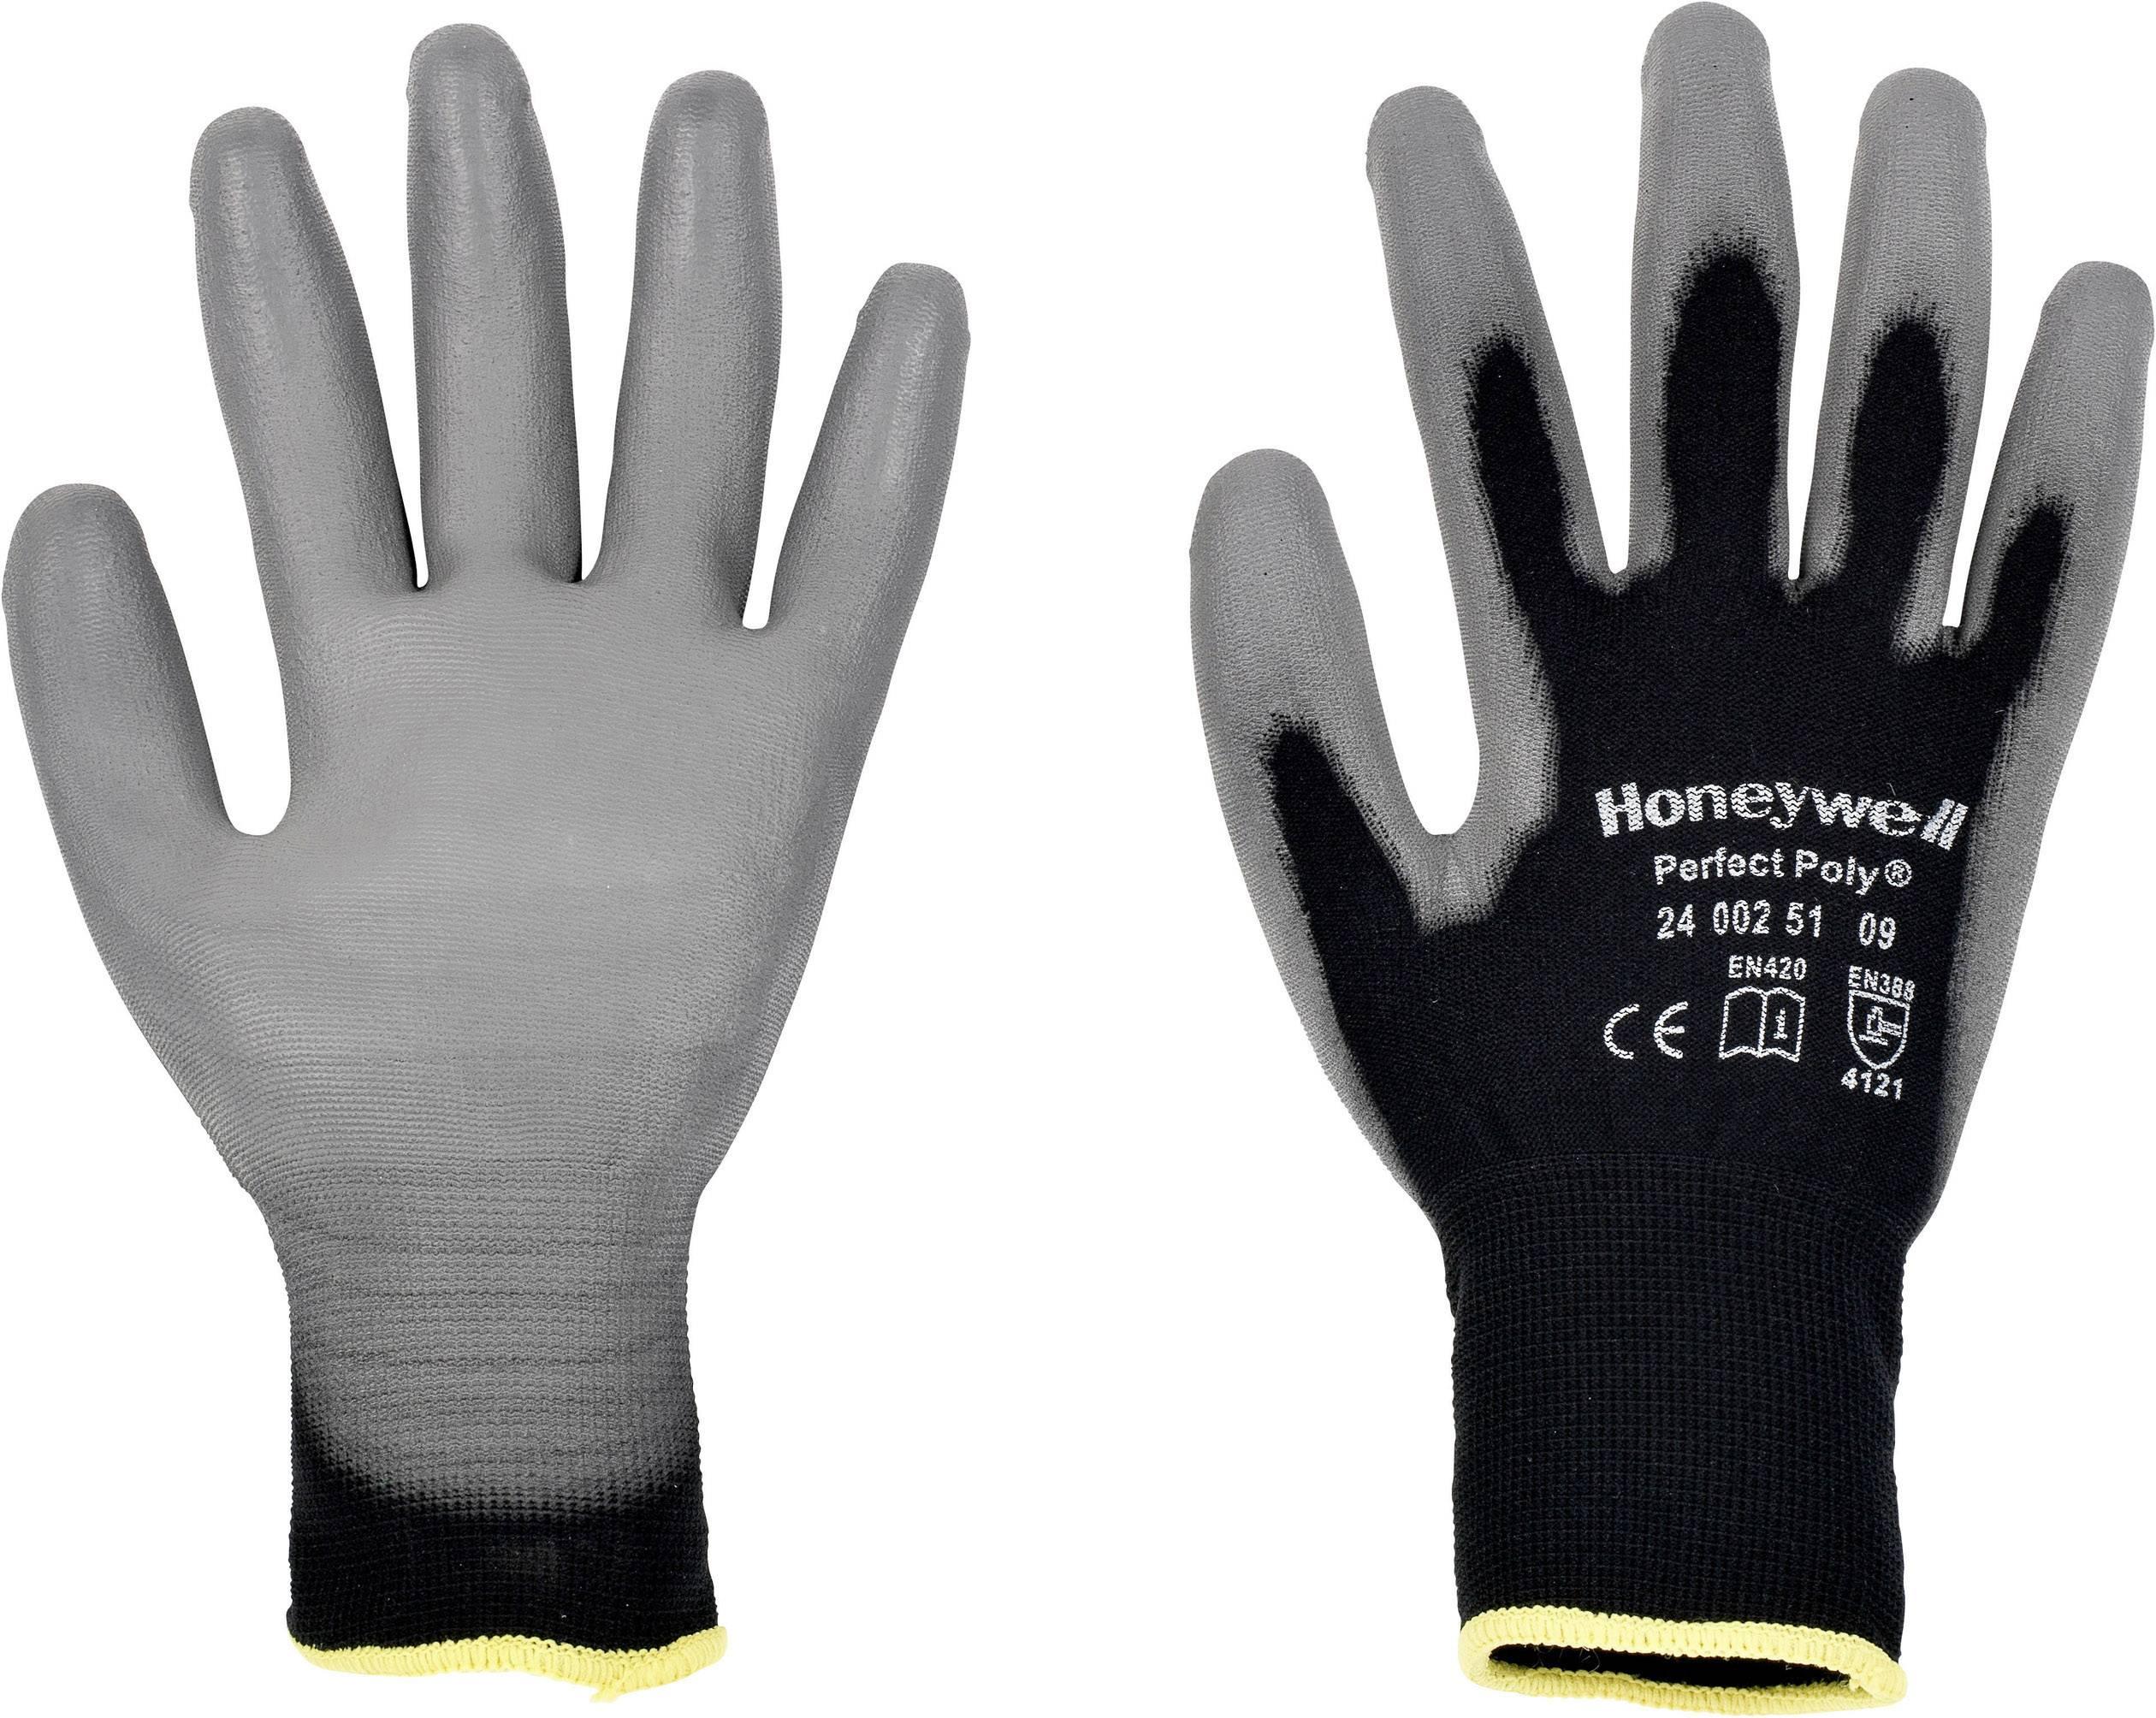 Pracovné rukavice Perfect Fit GANTS NOIRS PERFECTPOLY 2400251, velikost rukavic: 8, M